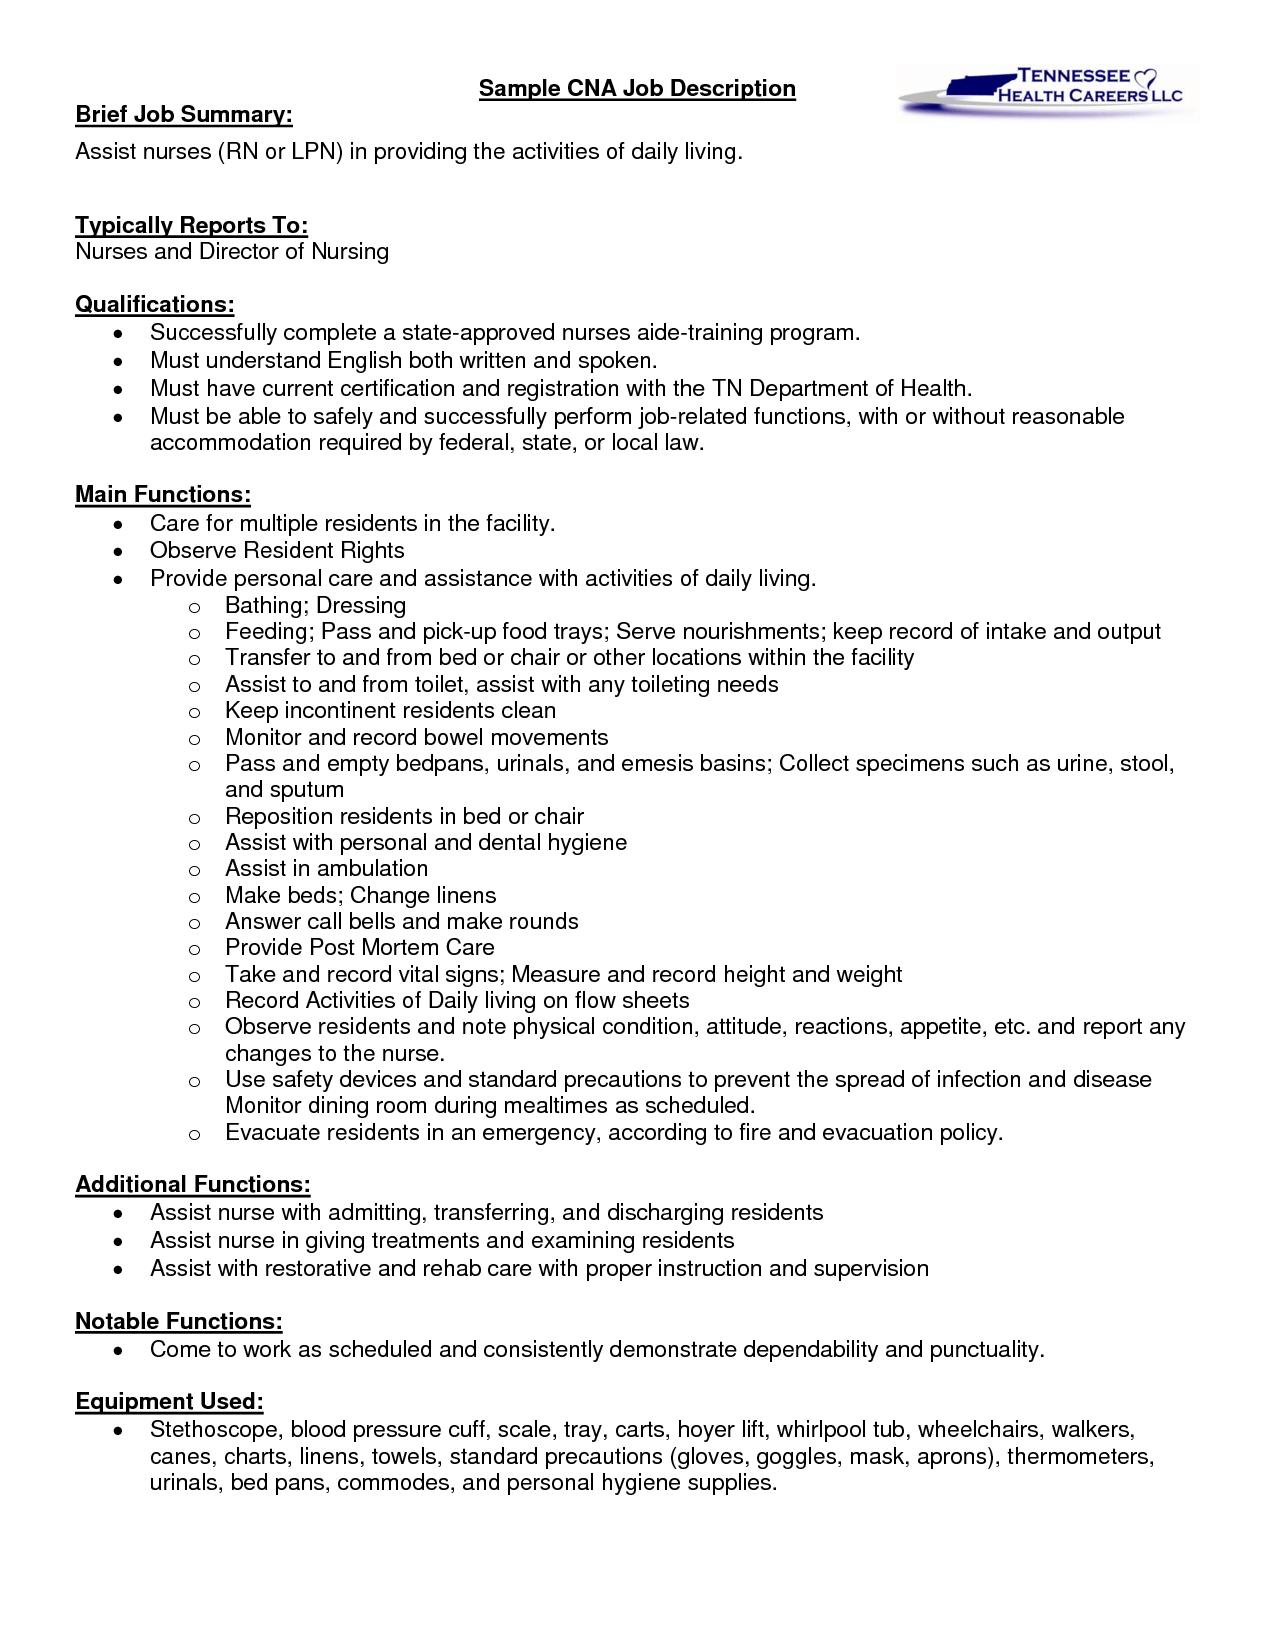 Cna Job Description For A Resume Cna Resume Sample Landing A Job As A Certified Nursing A Cna Job Description Let's Read Between The Lines